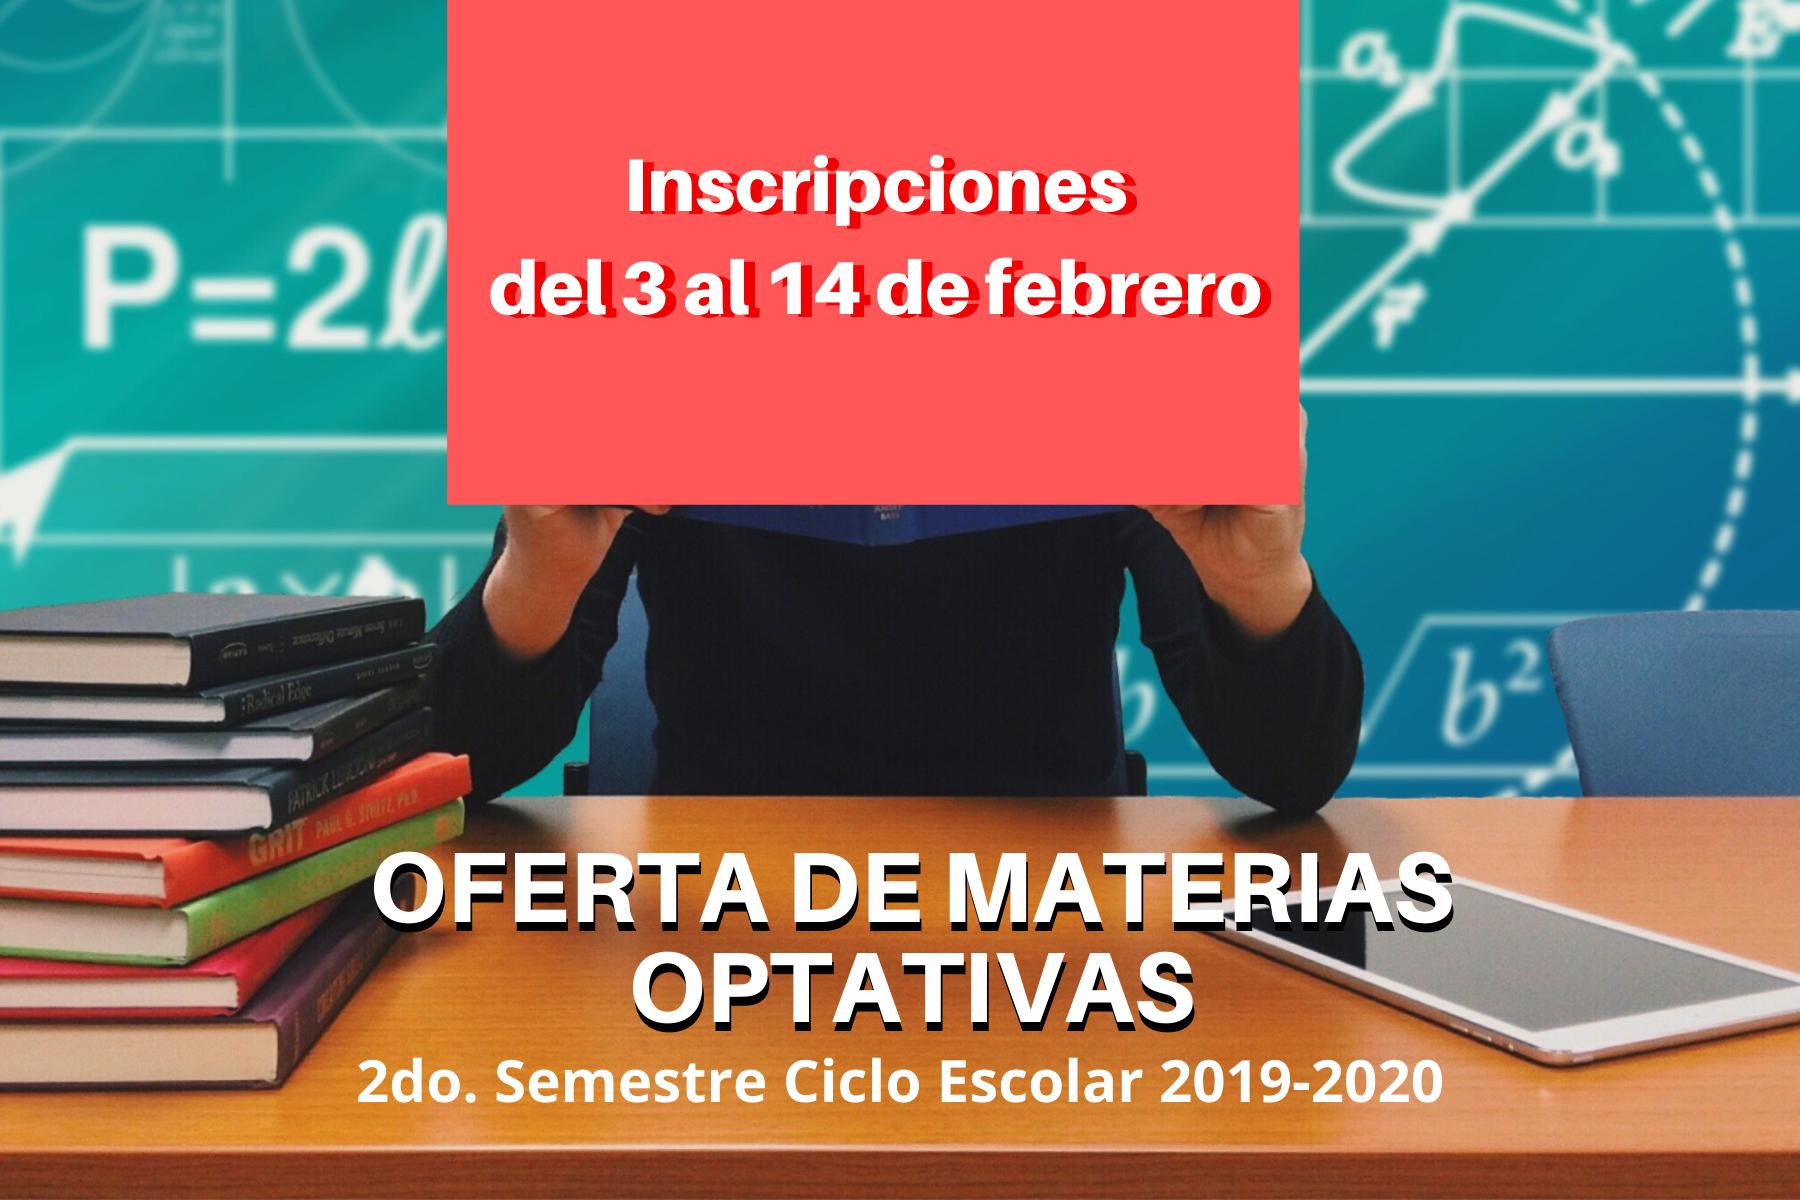 Oferta de Materias Optativas 2019-2020-II